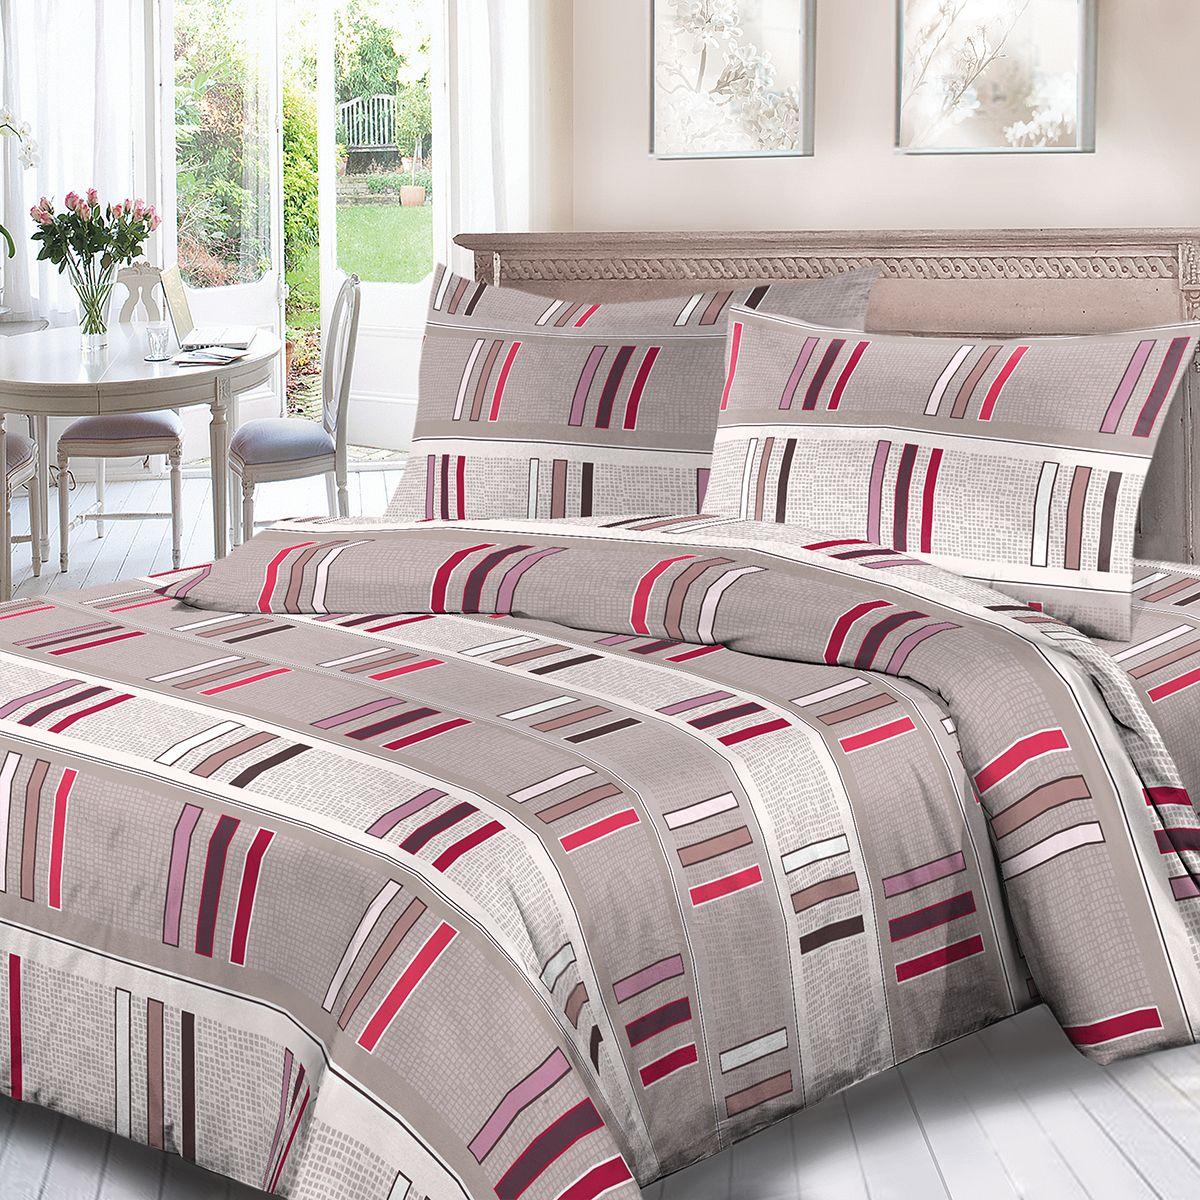 Комплект белья Для Снов Гранд, 2-х спальное, наволочки 70x70, цвет: серый. 1880-186493